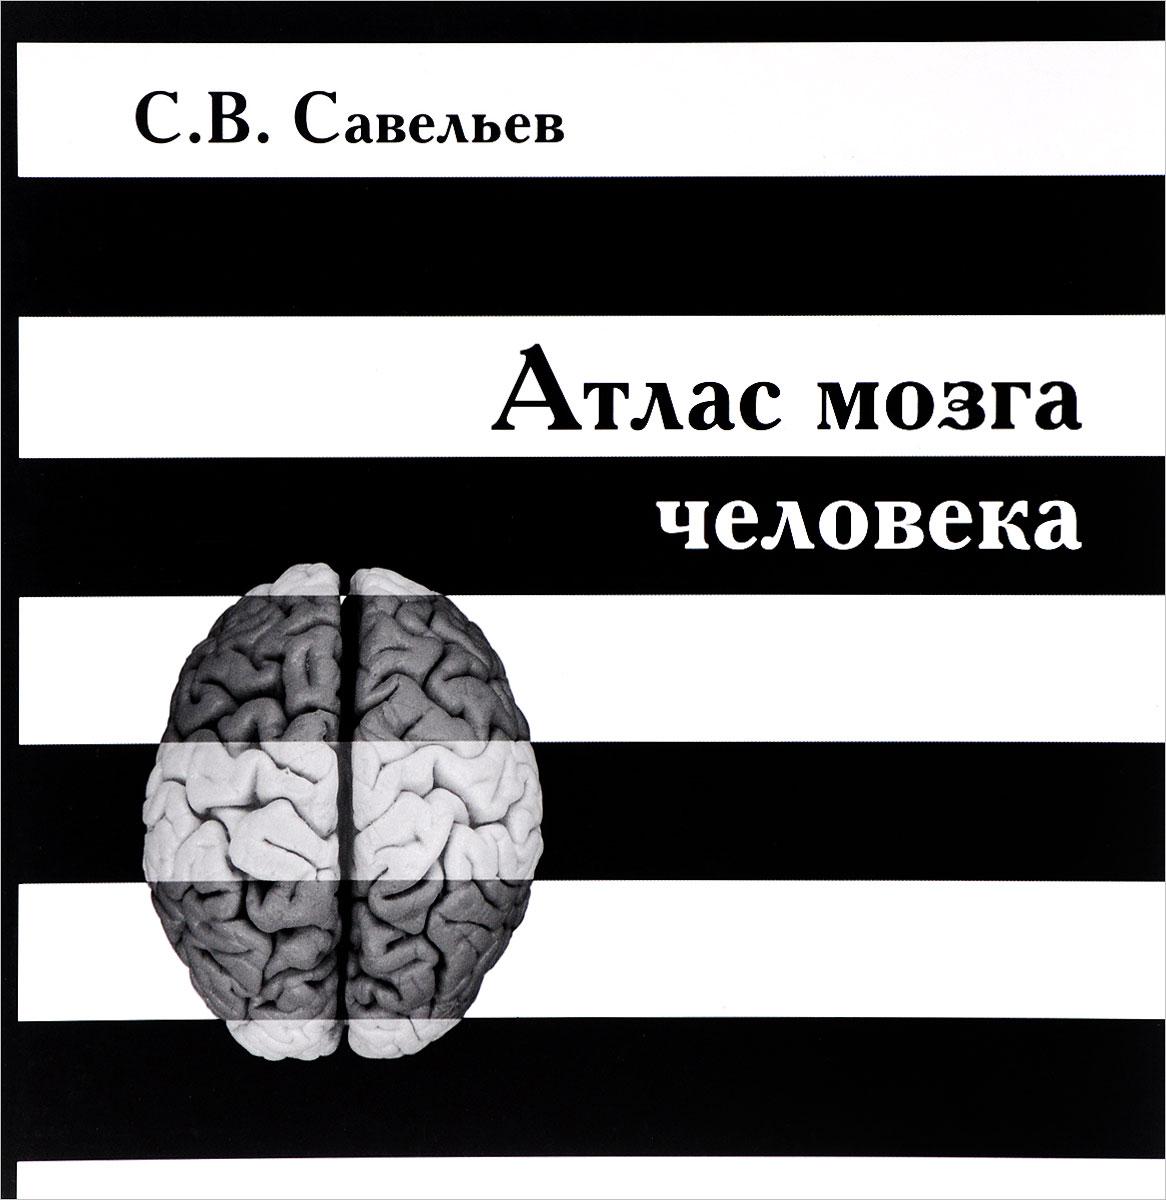 Атлас мозга человека